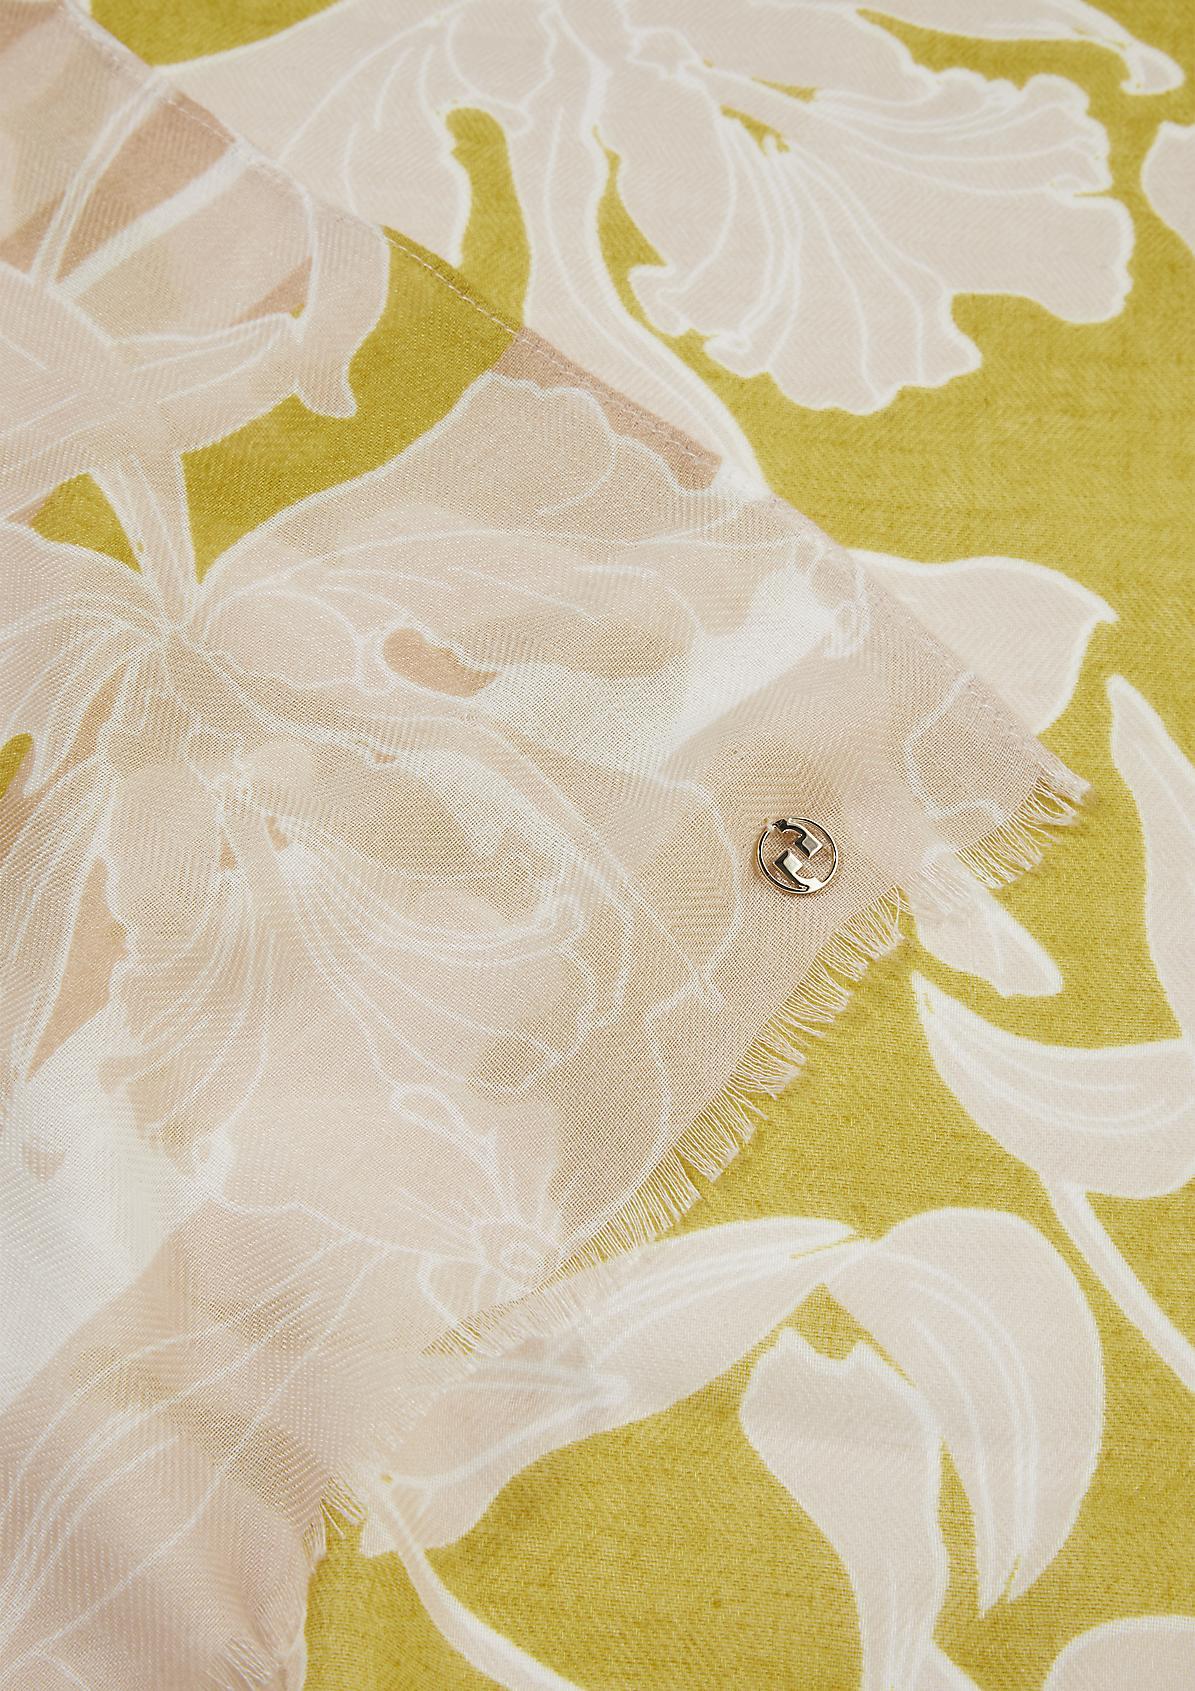 Tuch mit floralem Allover-Print